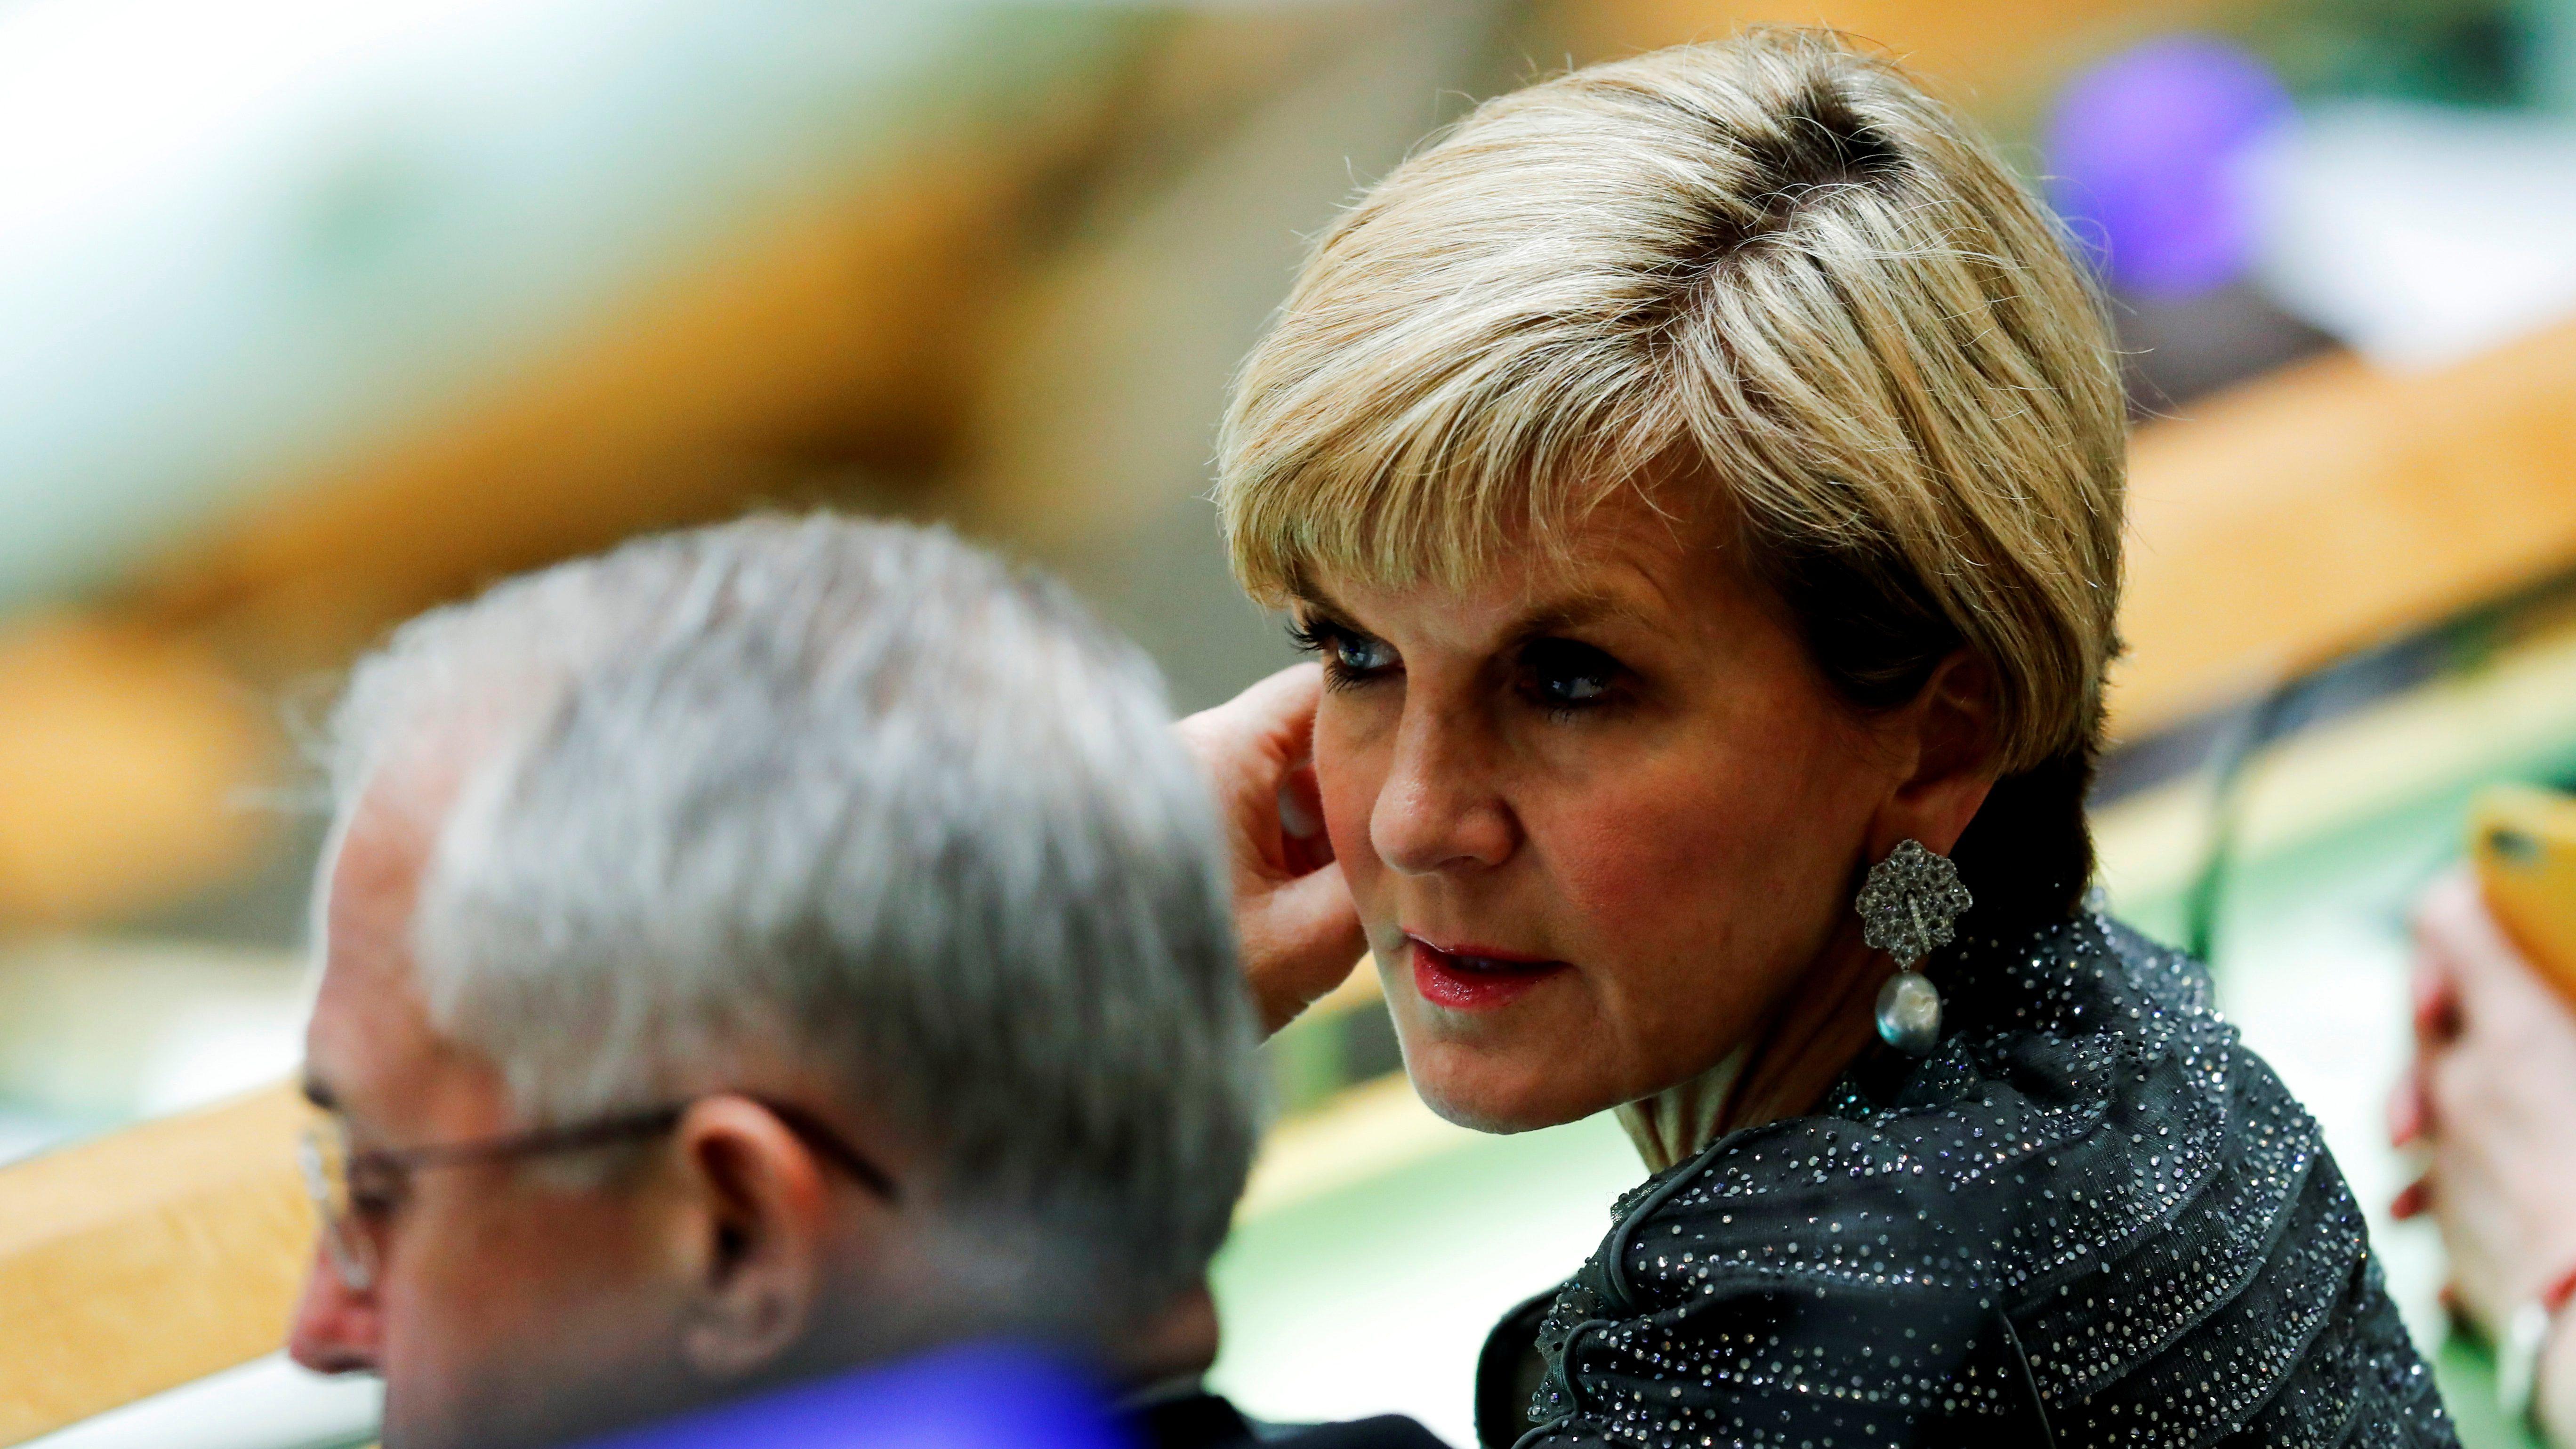 Australia's Foreign Minister Julie Bishop speaks to Australia's Prime Minister Malcolm Turnbull